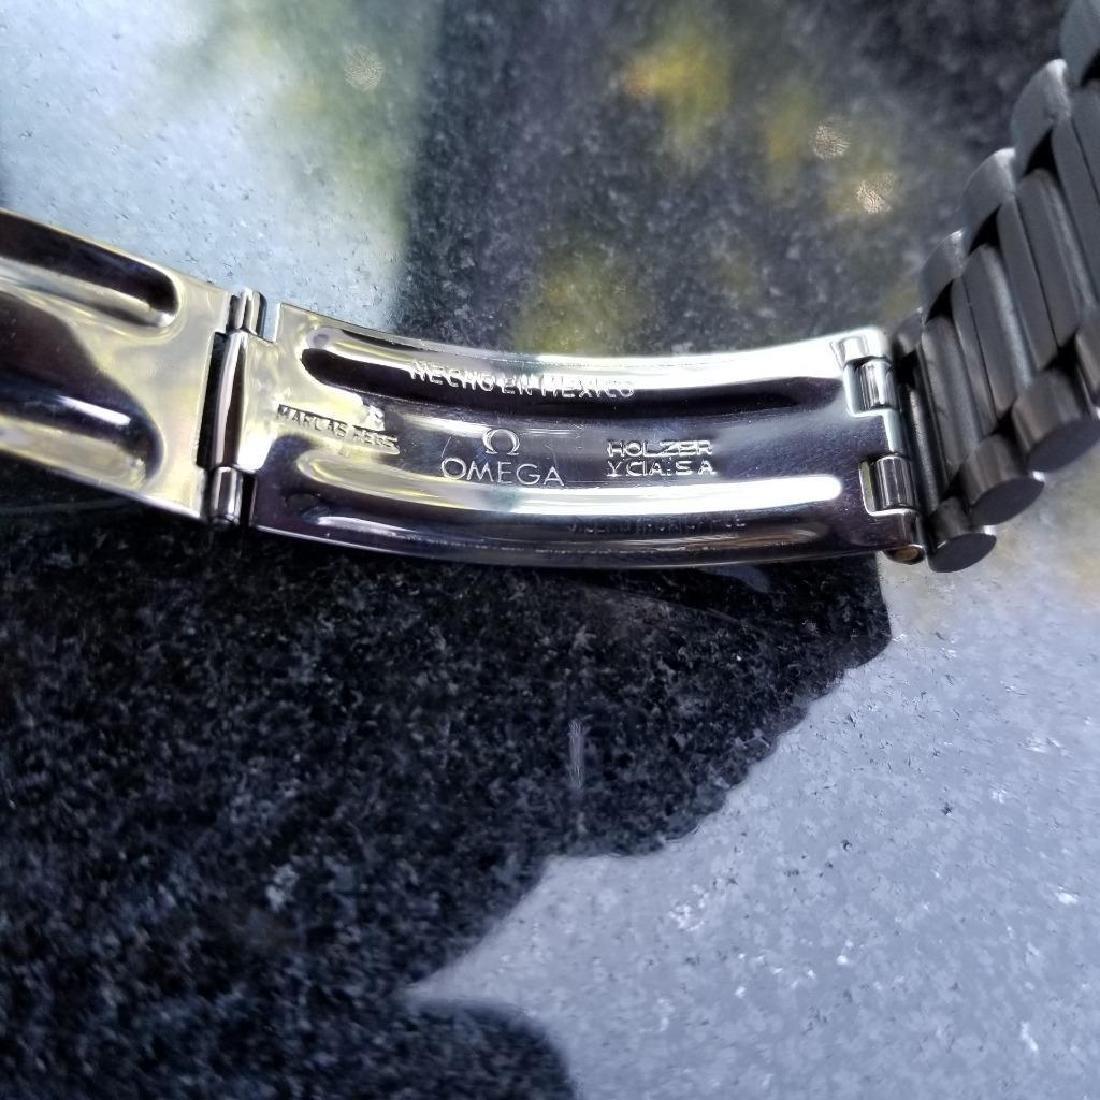 Omega Speedmaster Professional Chrono Mark III Mens - 7